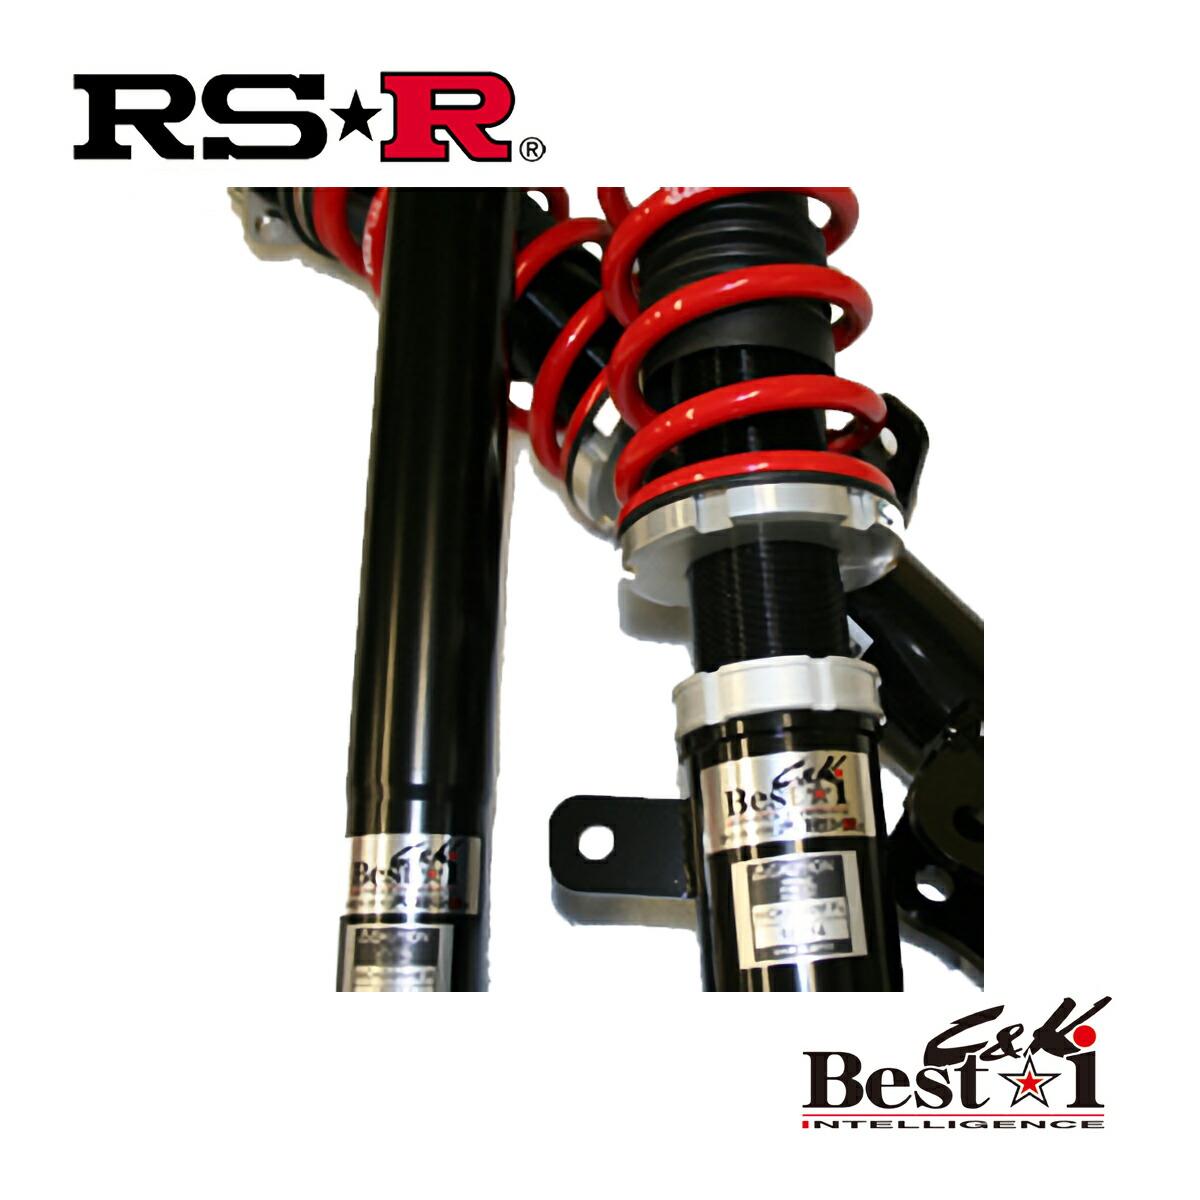 RS-R スペーシアギア MK53S ハイブリッドXZ 車高調 リア車高調整:ネジ式 BICKS191M ベストi C&K RSR 個人宅発送追金有